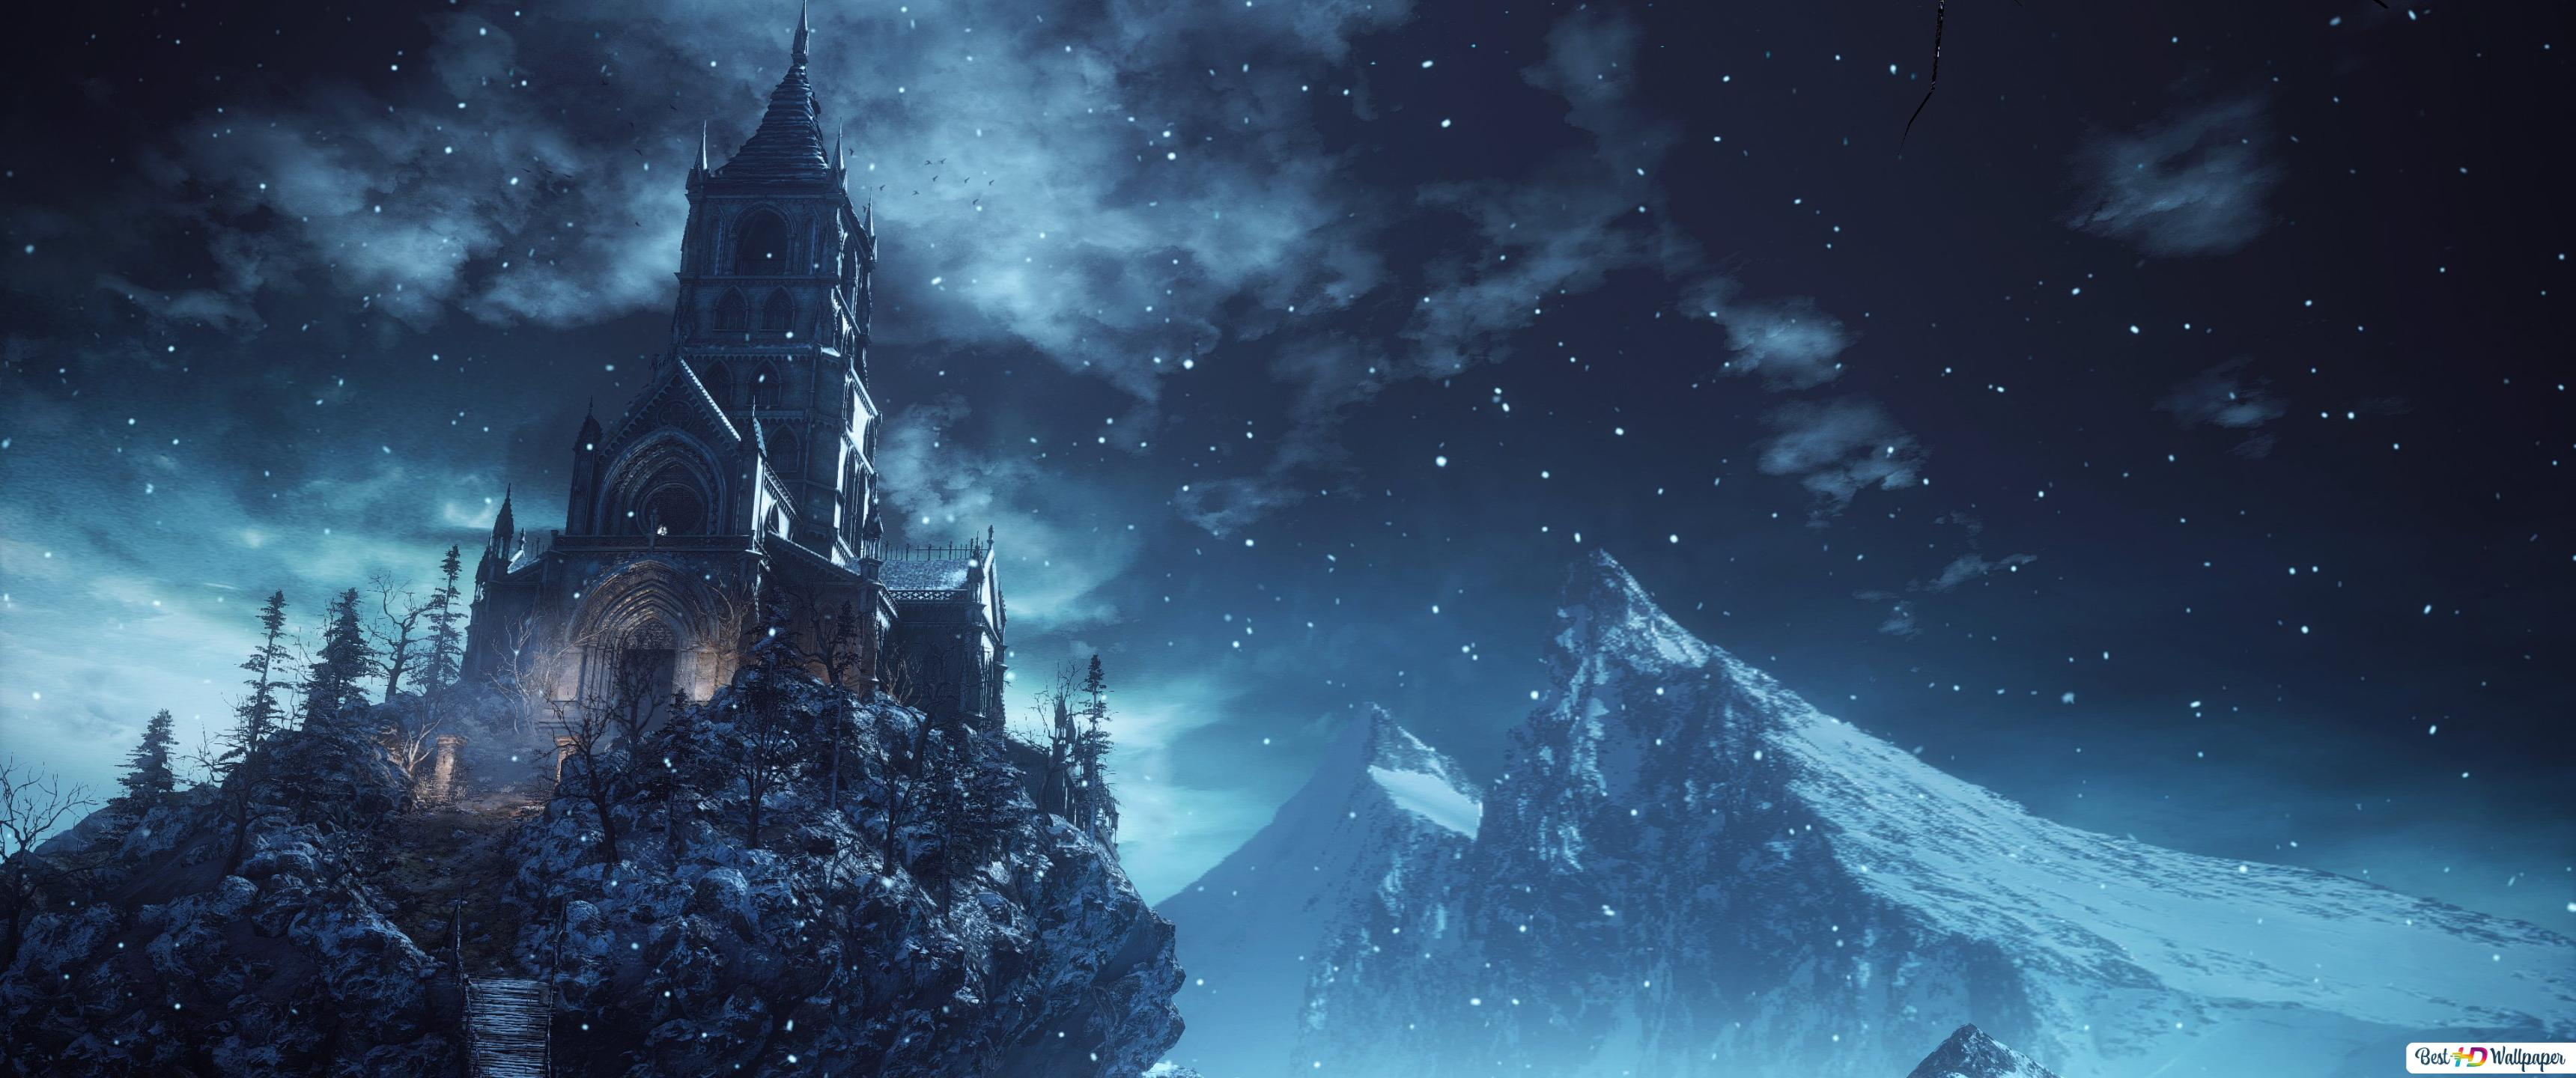 Dark Souls 3 21 9: Dark Souls III HD Wallpaper Download